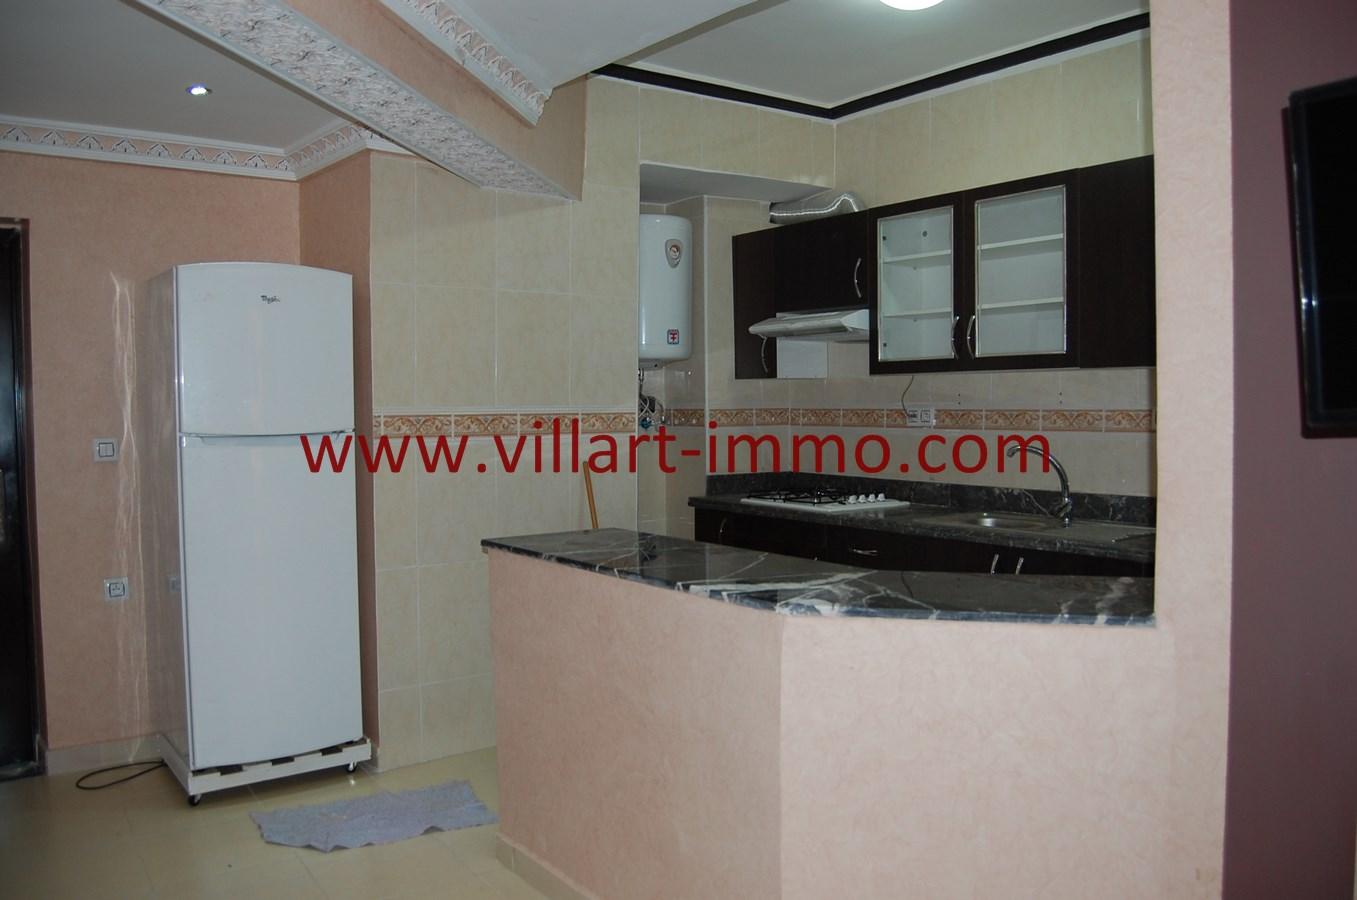 4-Vente-Appartement-Tanger-Malabata-Cuisine-VA486-Villart Immo